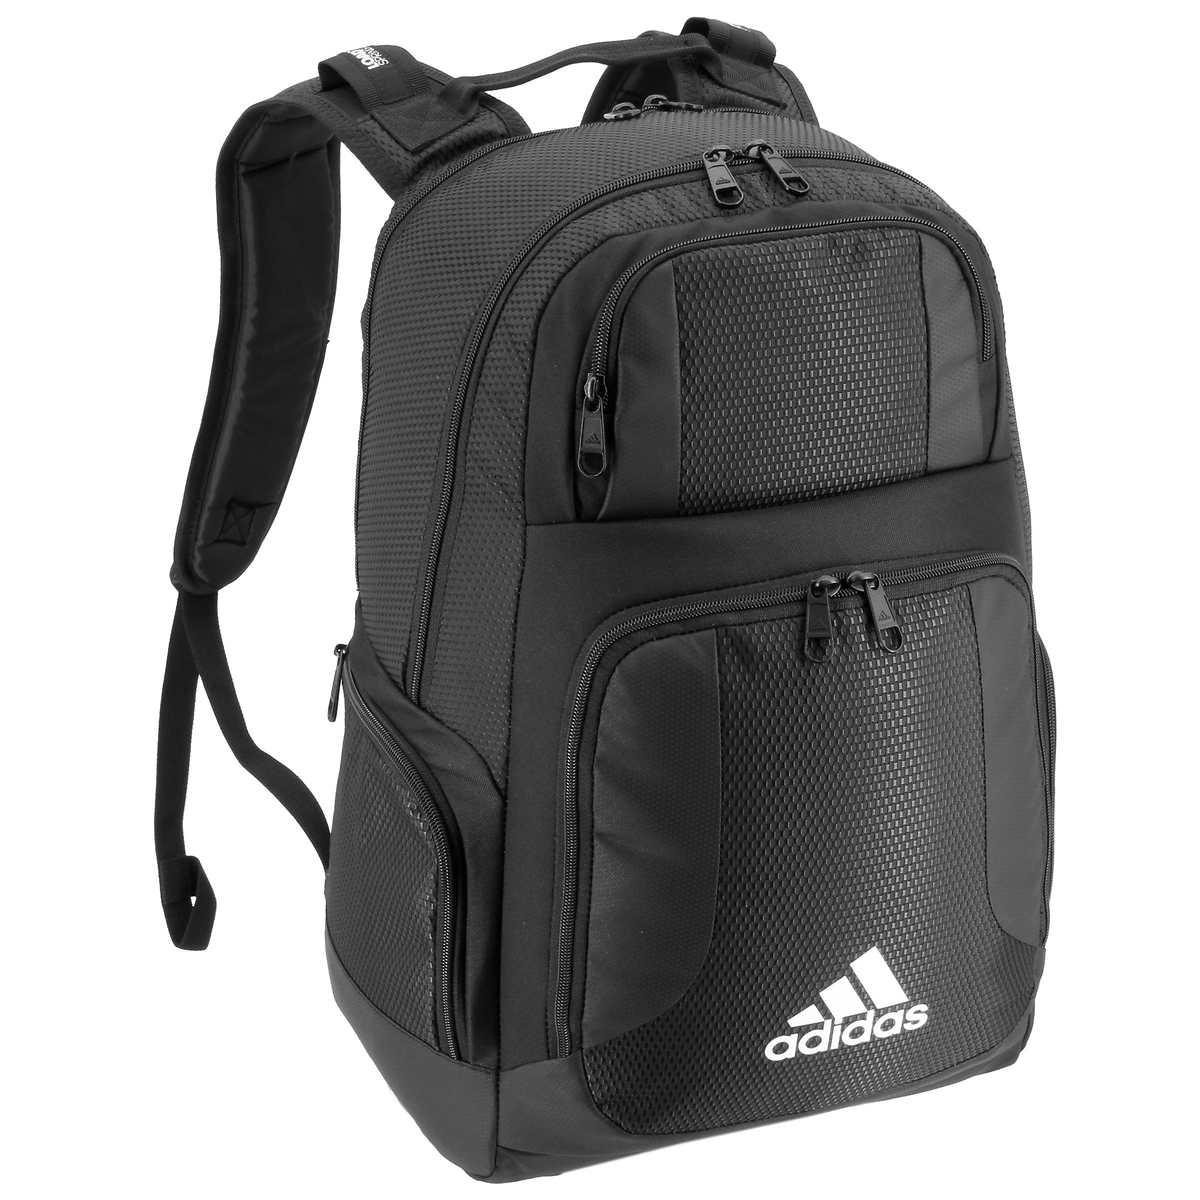 4d534b2ead0 Adidas Strength Backpack, Black